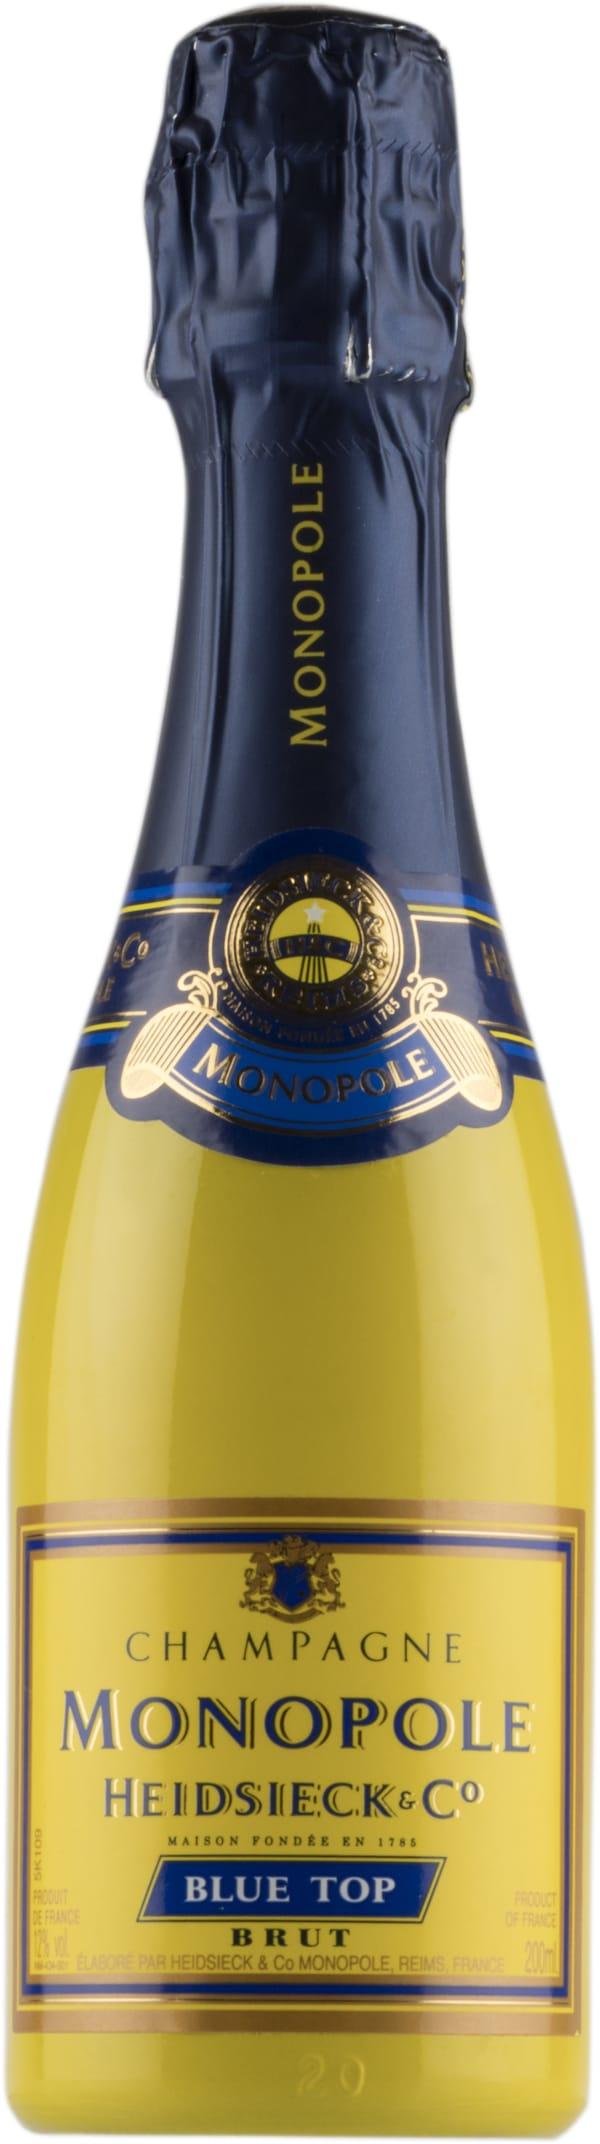 Heidsieck Monopole Blue Top Champagne Brut